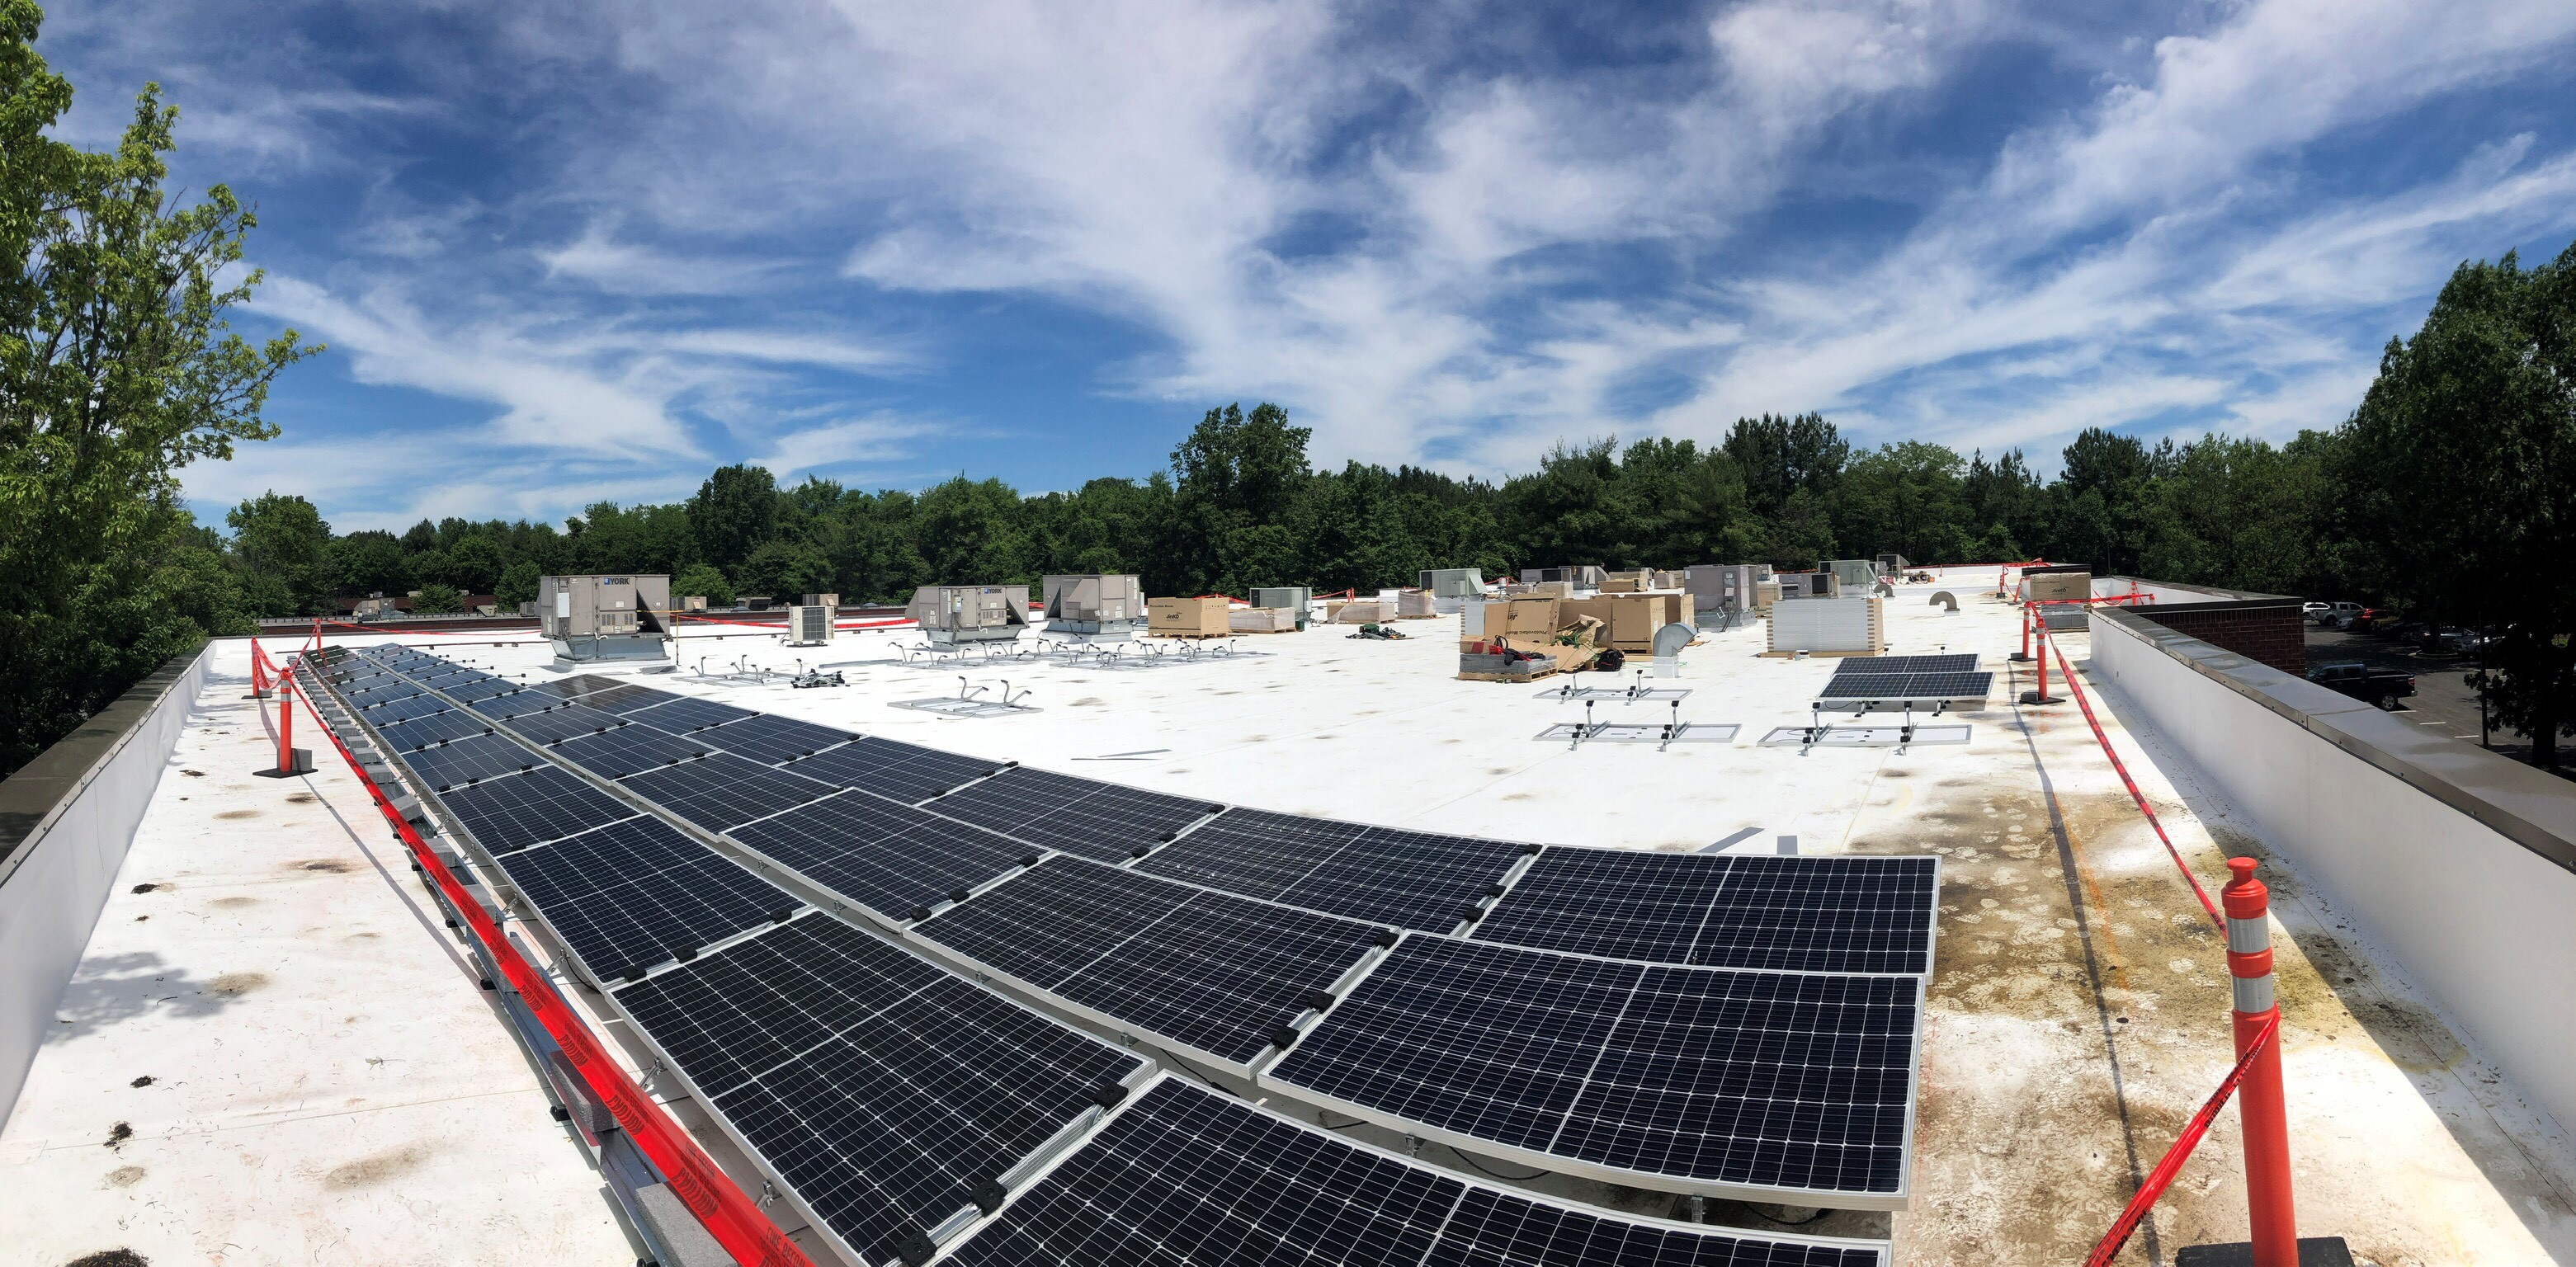 Solar panel roof progress on HR Construction building